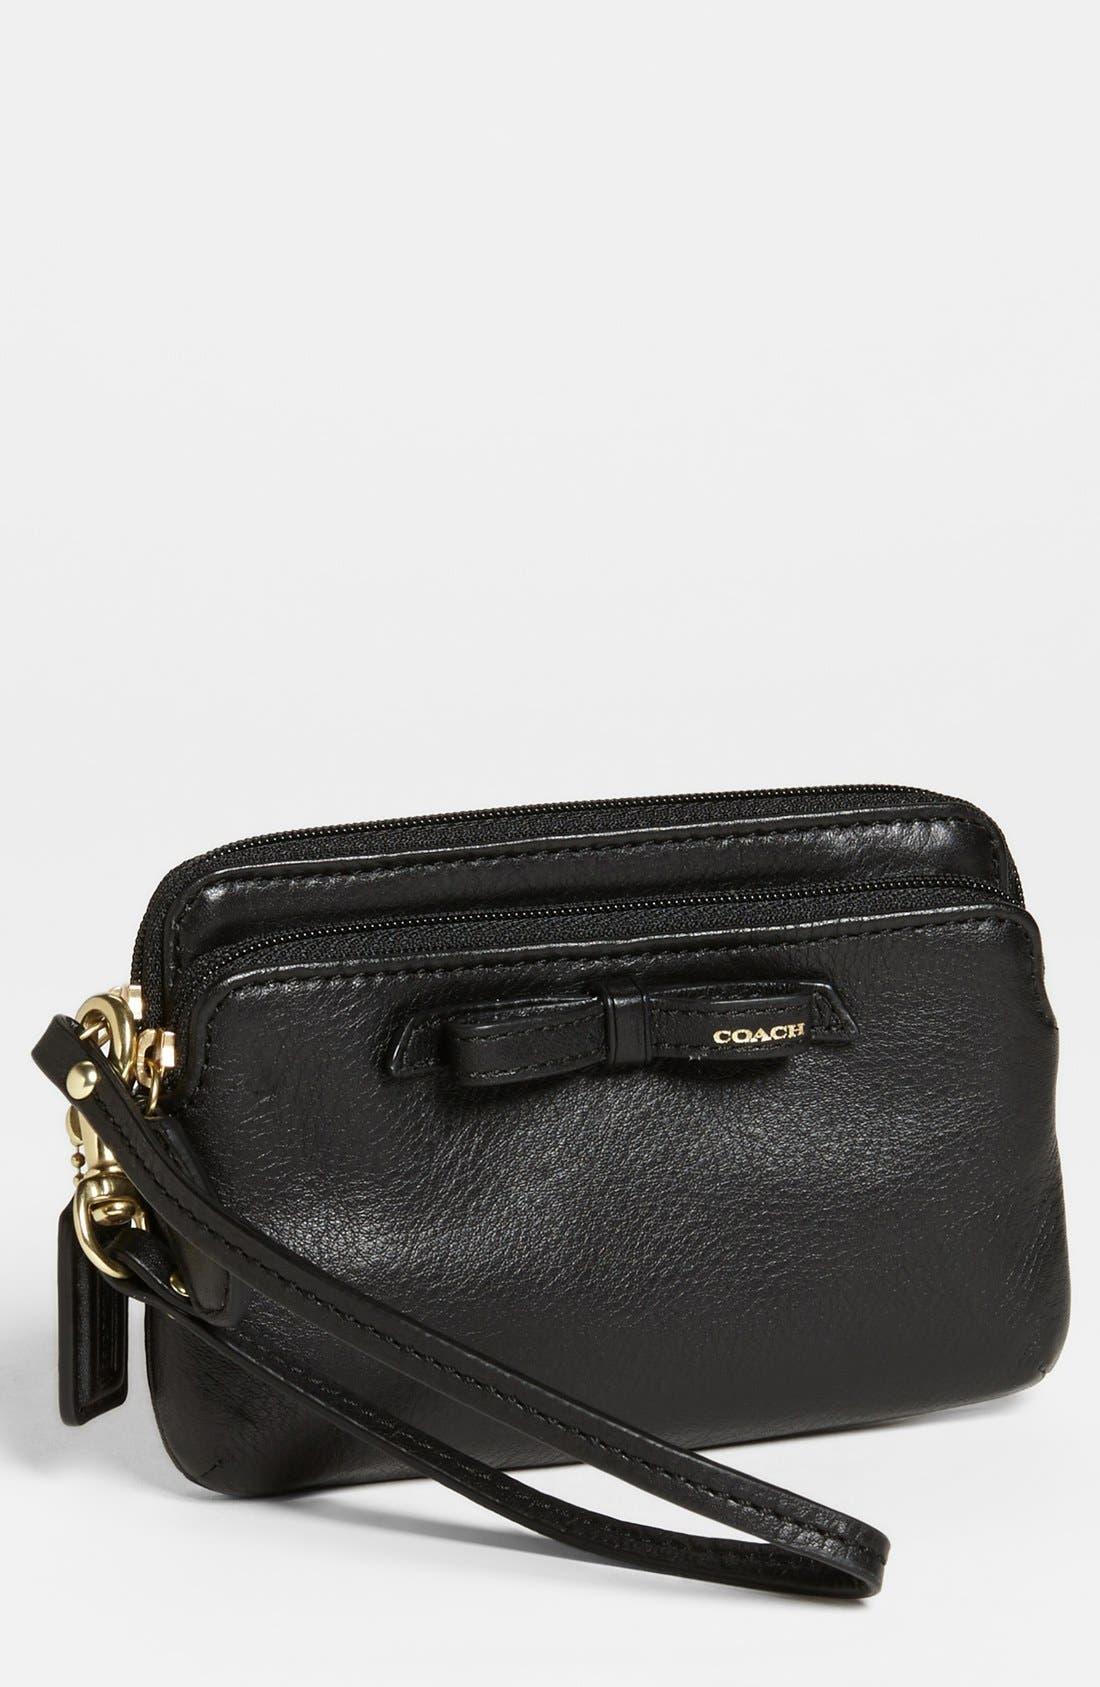 Main Image - COACH 'Poppy' Leather Wristlet